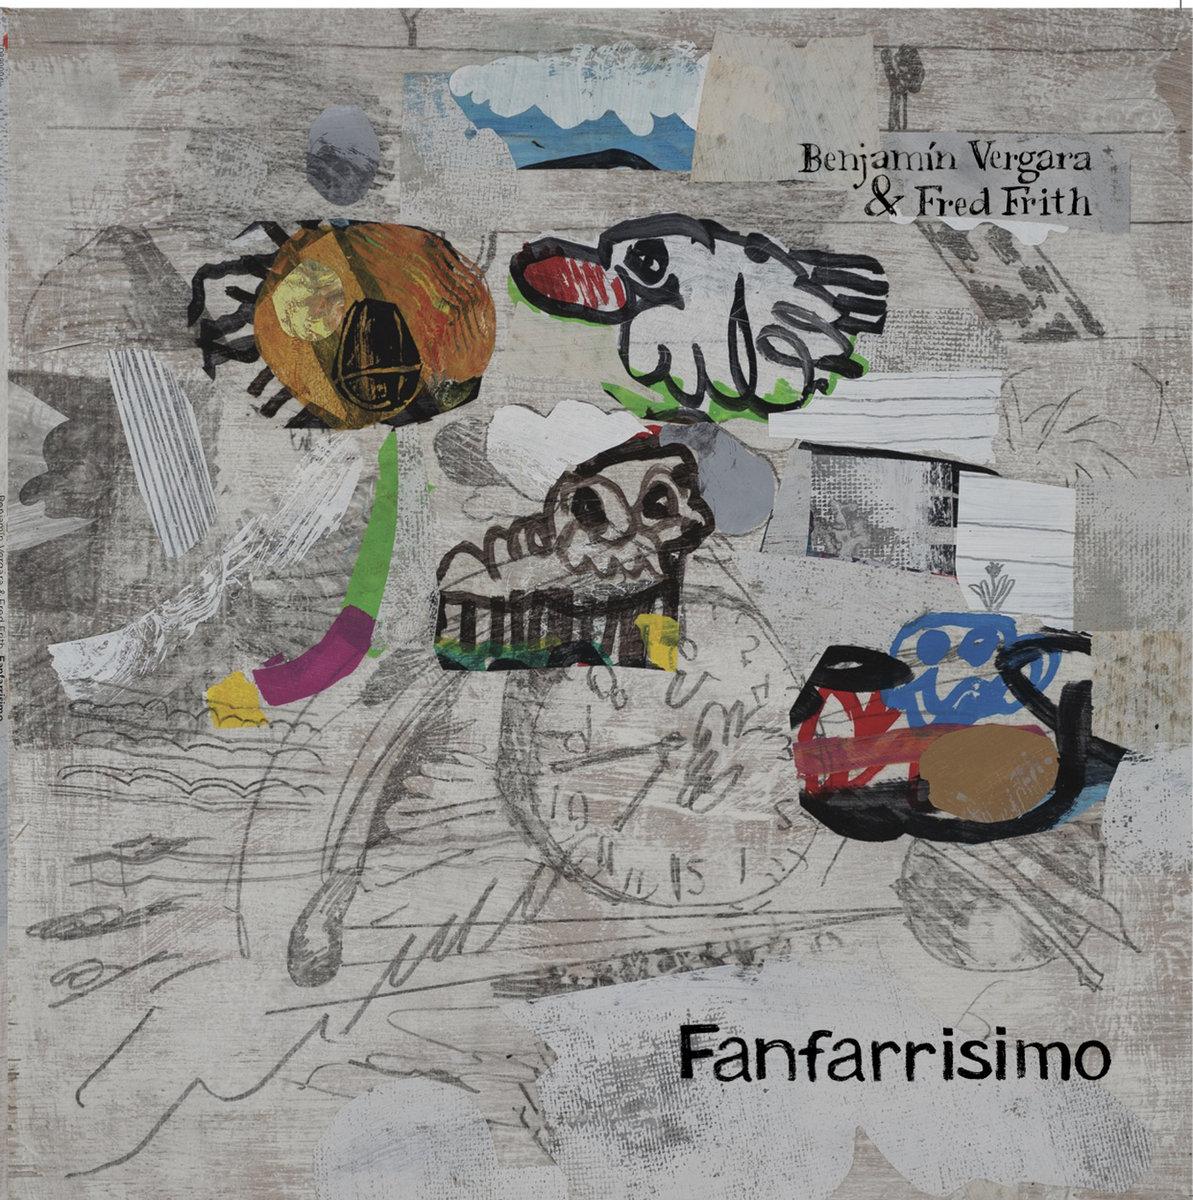 Fred Frith & Benjamin Vergara - Fanfarrisimo [2020]